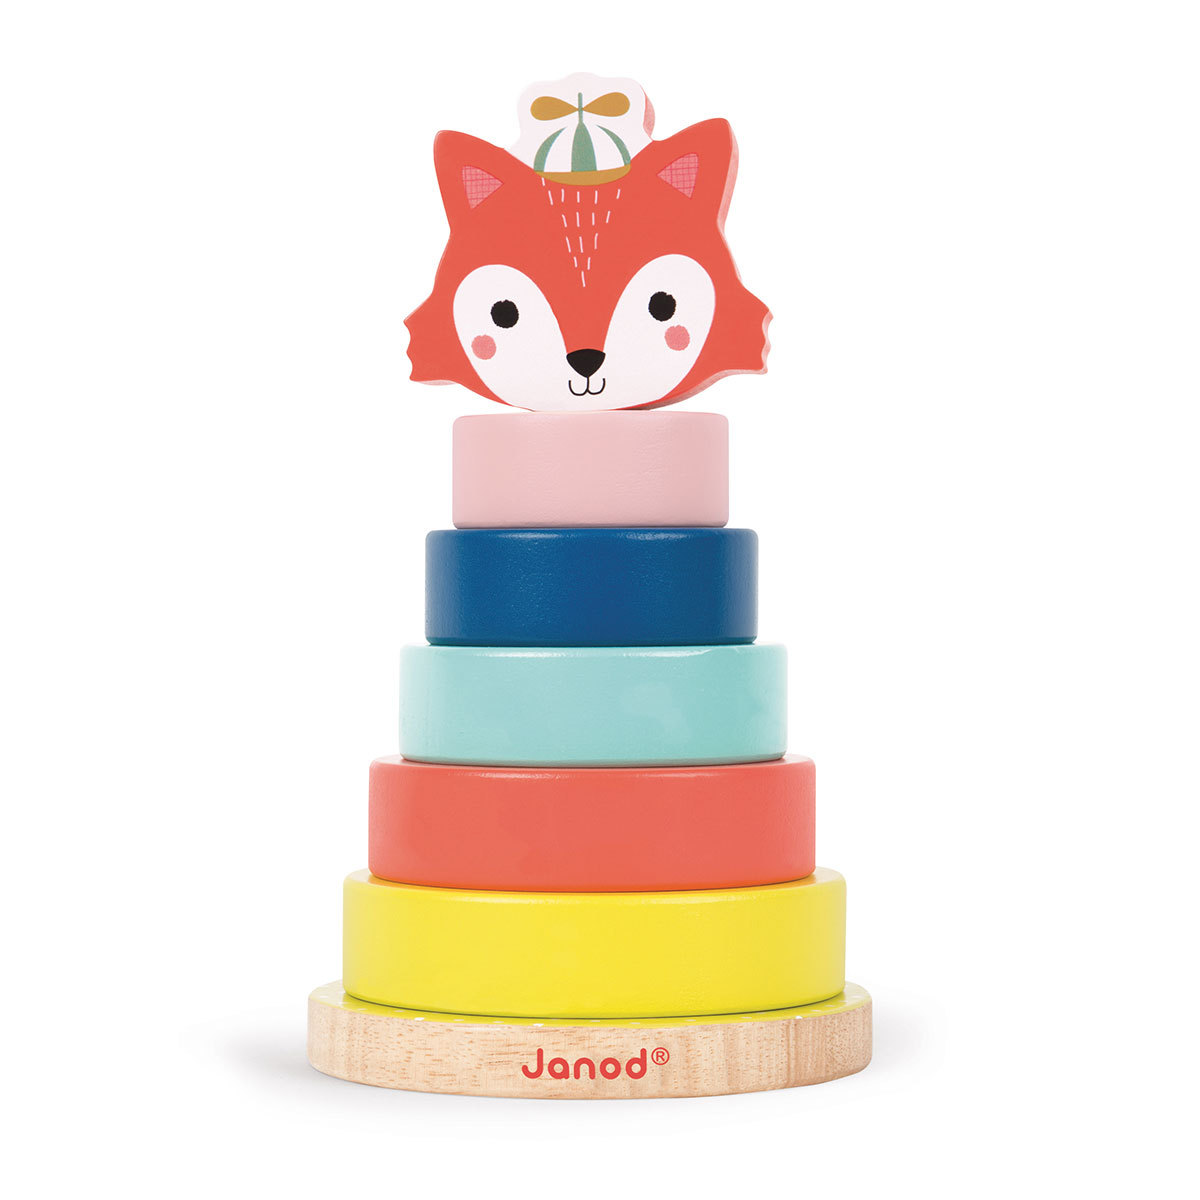 Mes premiers jouets Jeu Empilable Renard - Baby Forest Jeu Empilable Renard - Baby Forest